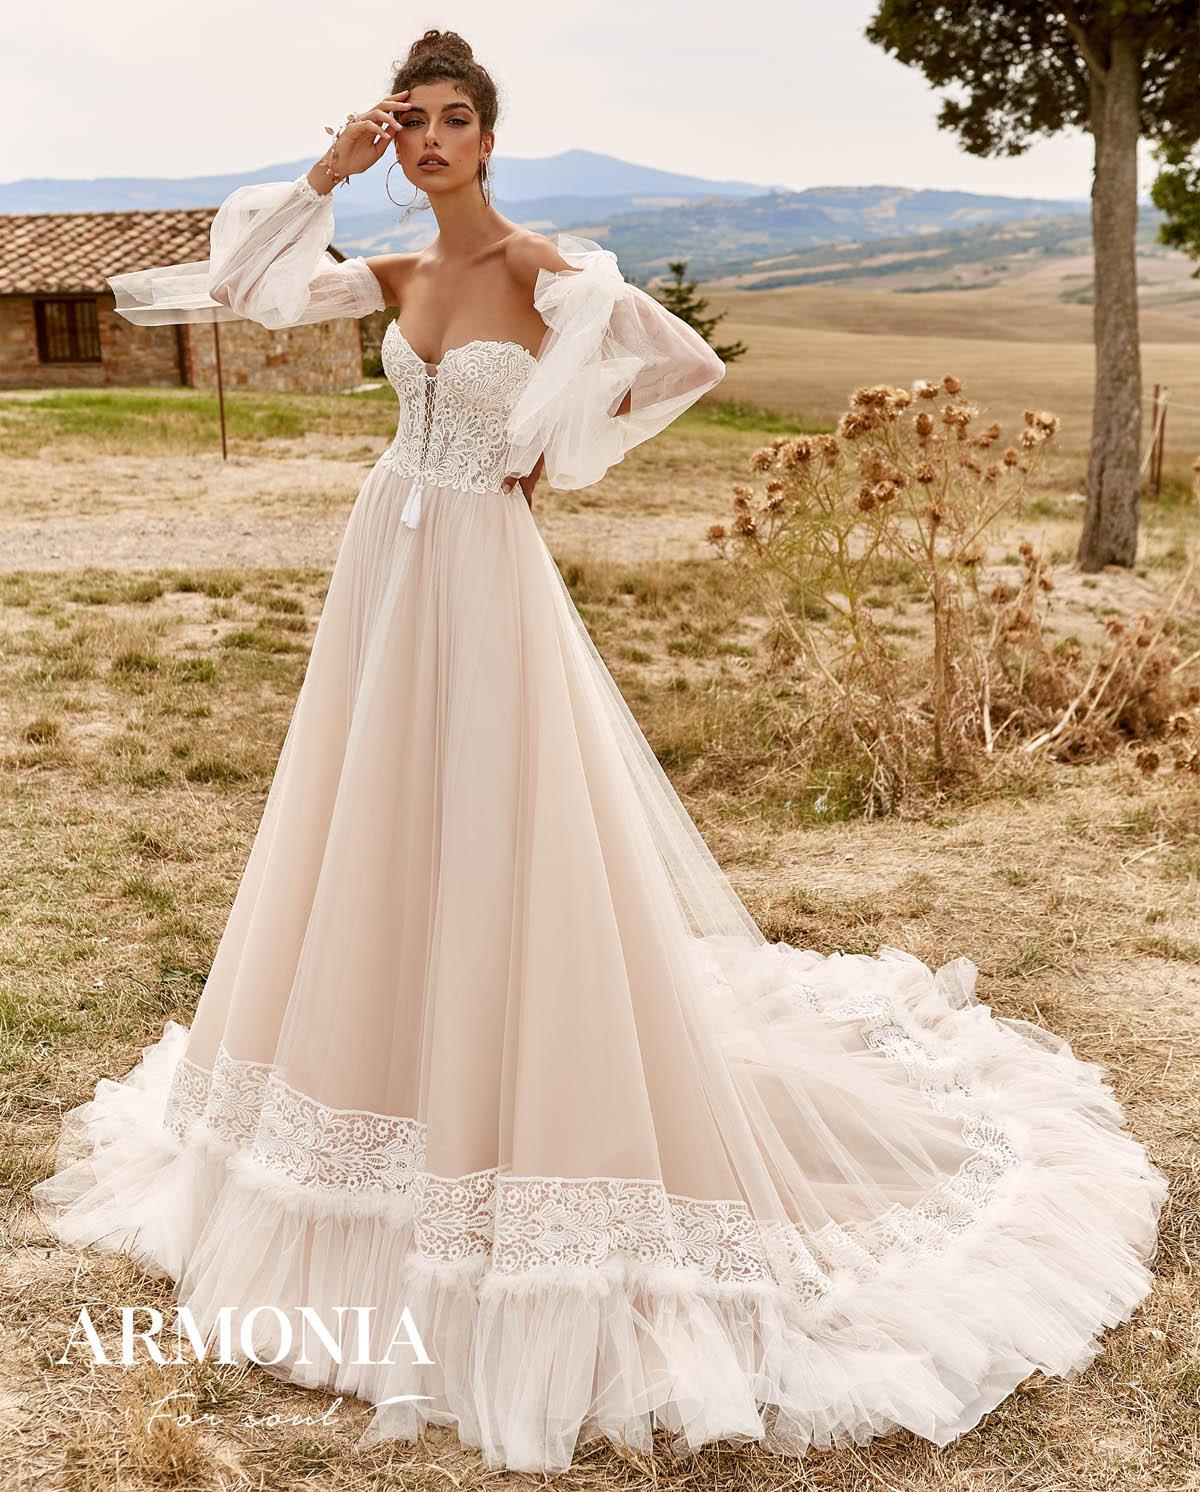 Cвадебное платье Aroma